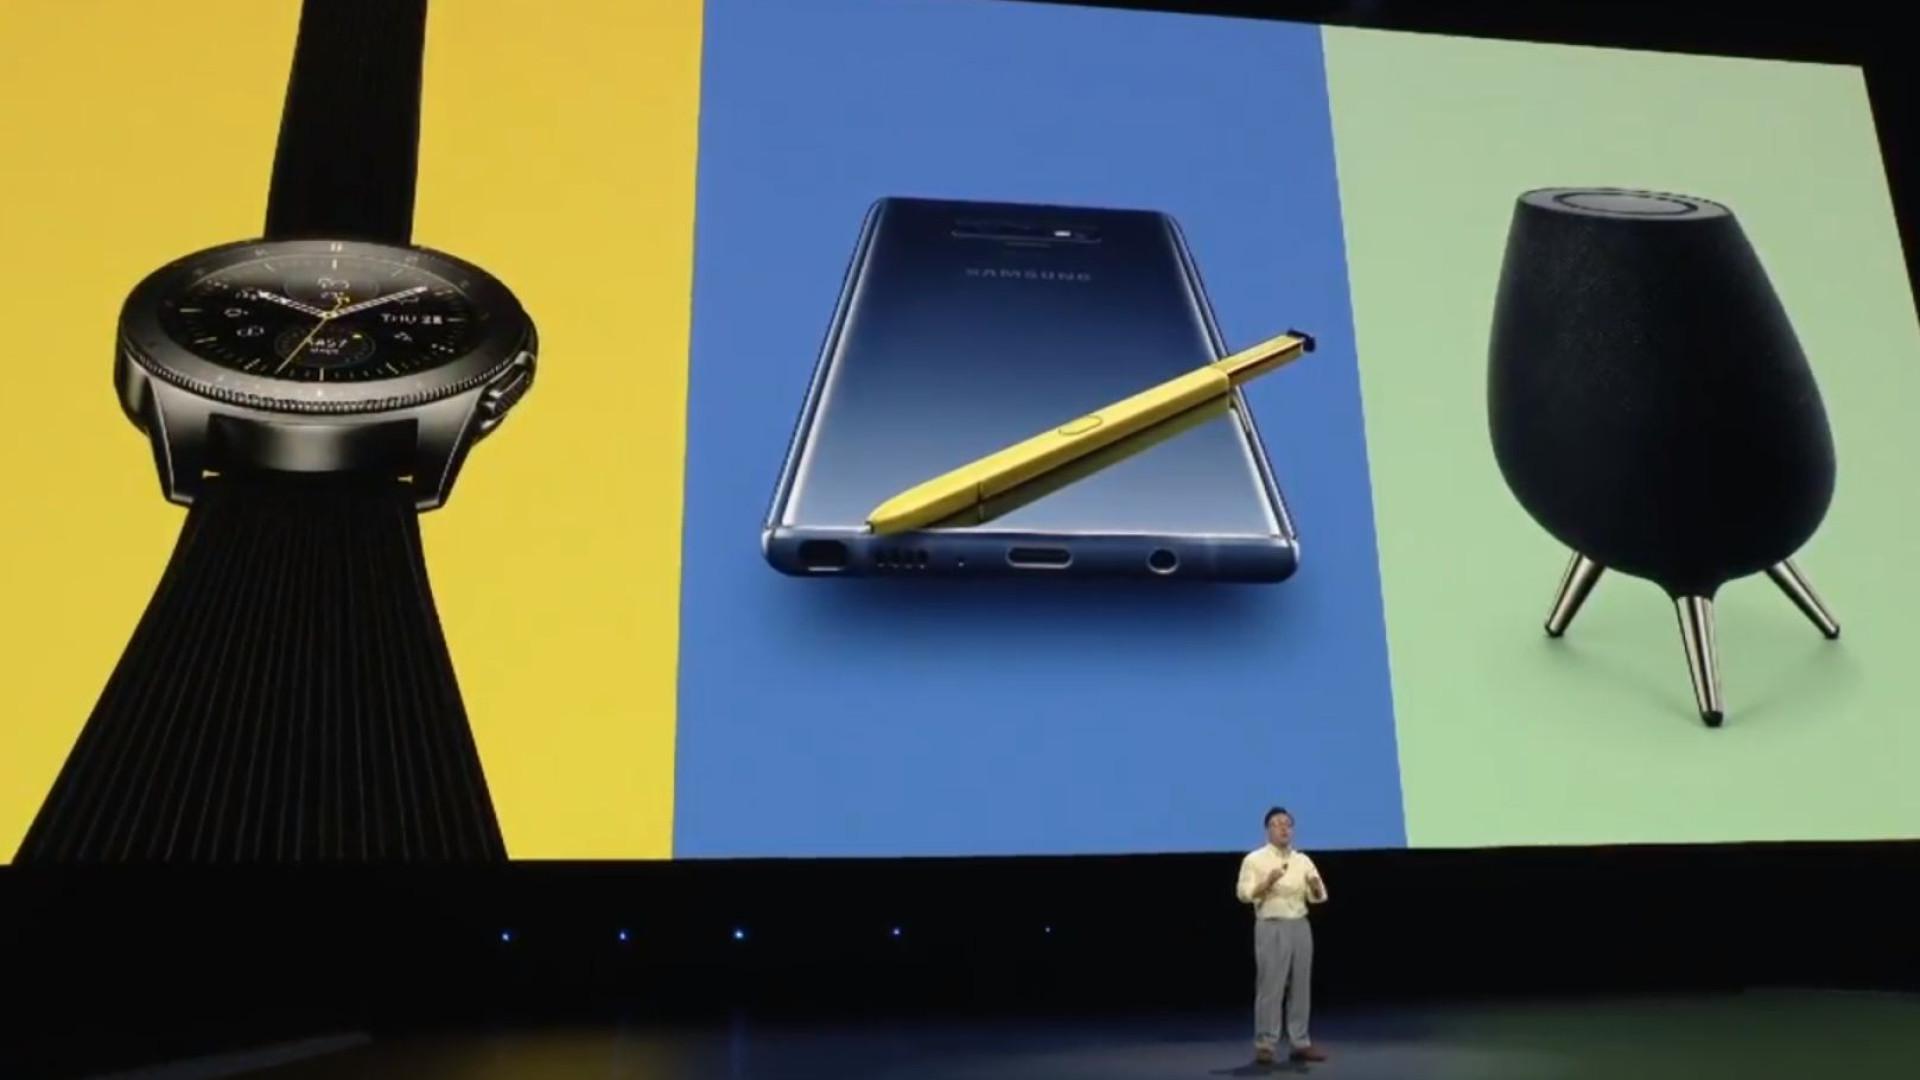 Galaxy Note 9 foi 'estrela' do evento da Samsung. Eis o que foi anunciado